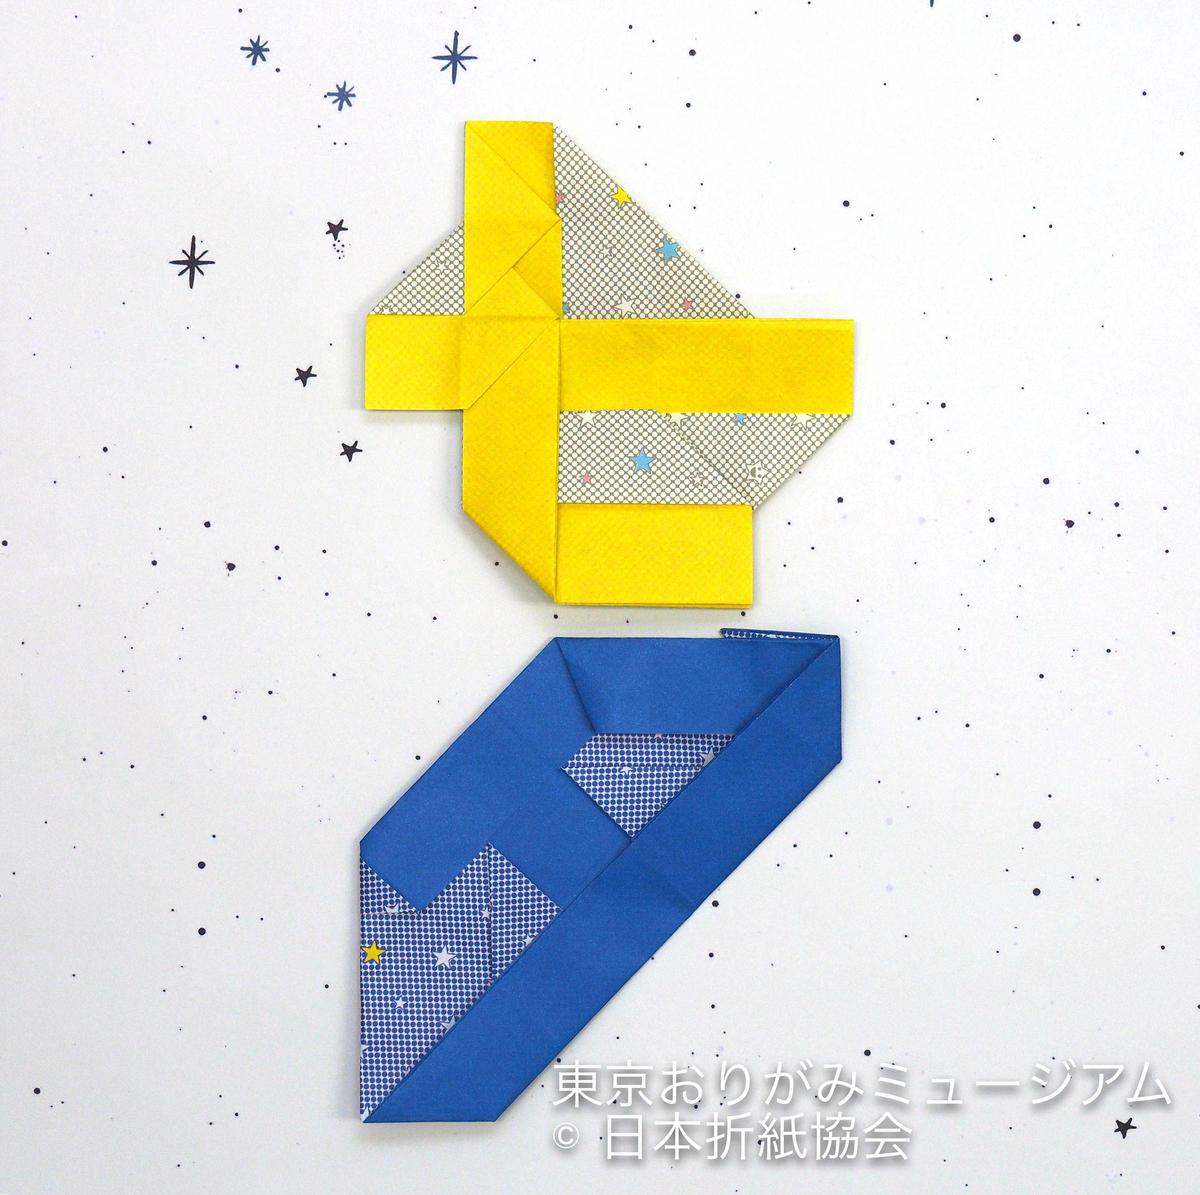 f:id:origami-noa:20190702150318j:plain